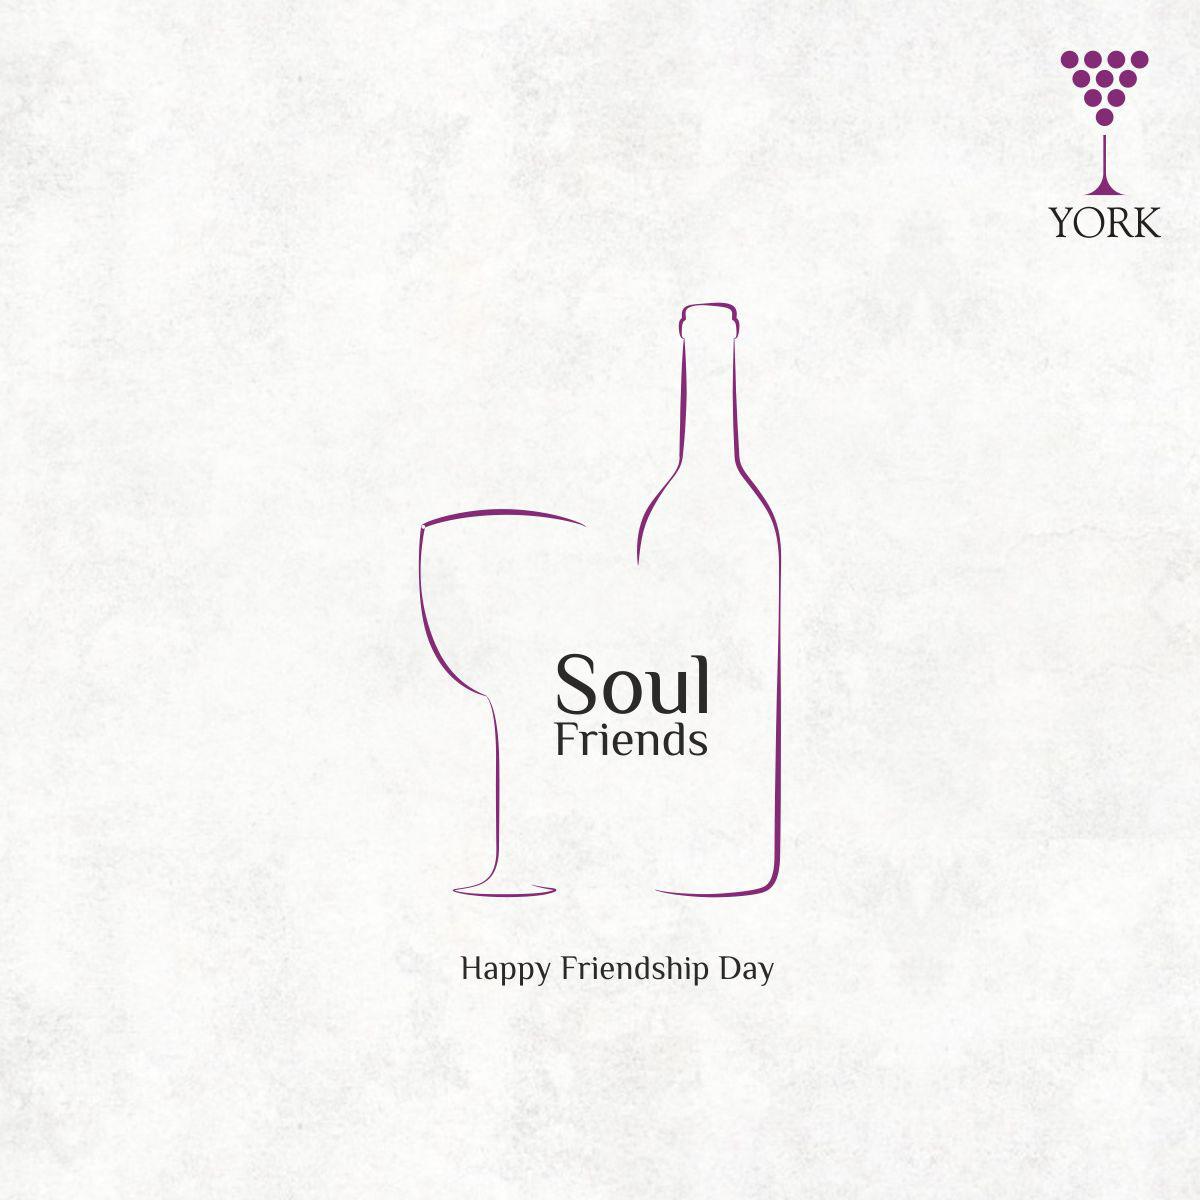 Yorkwinery winery wine Socialmedia redwine whitewine indianwine nashik Startup Farms